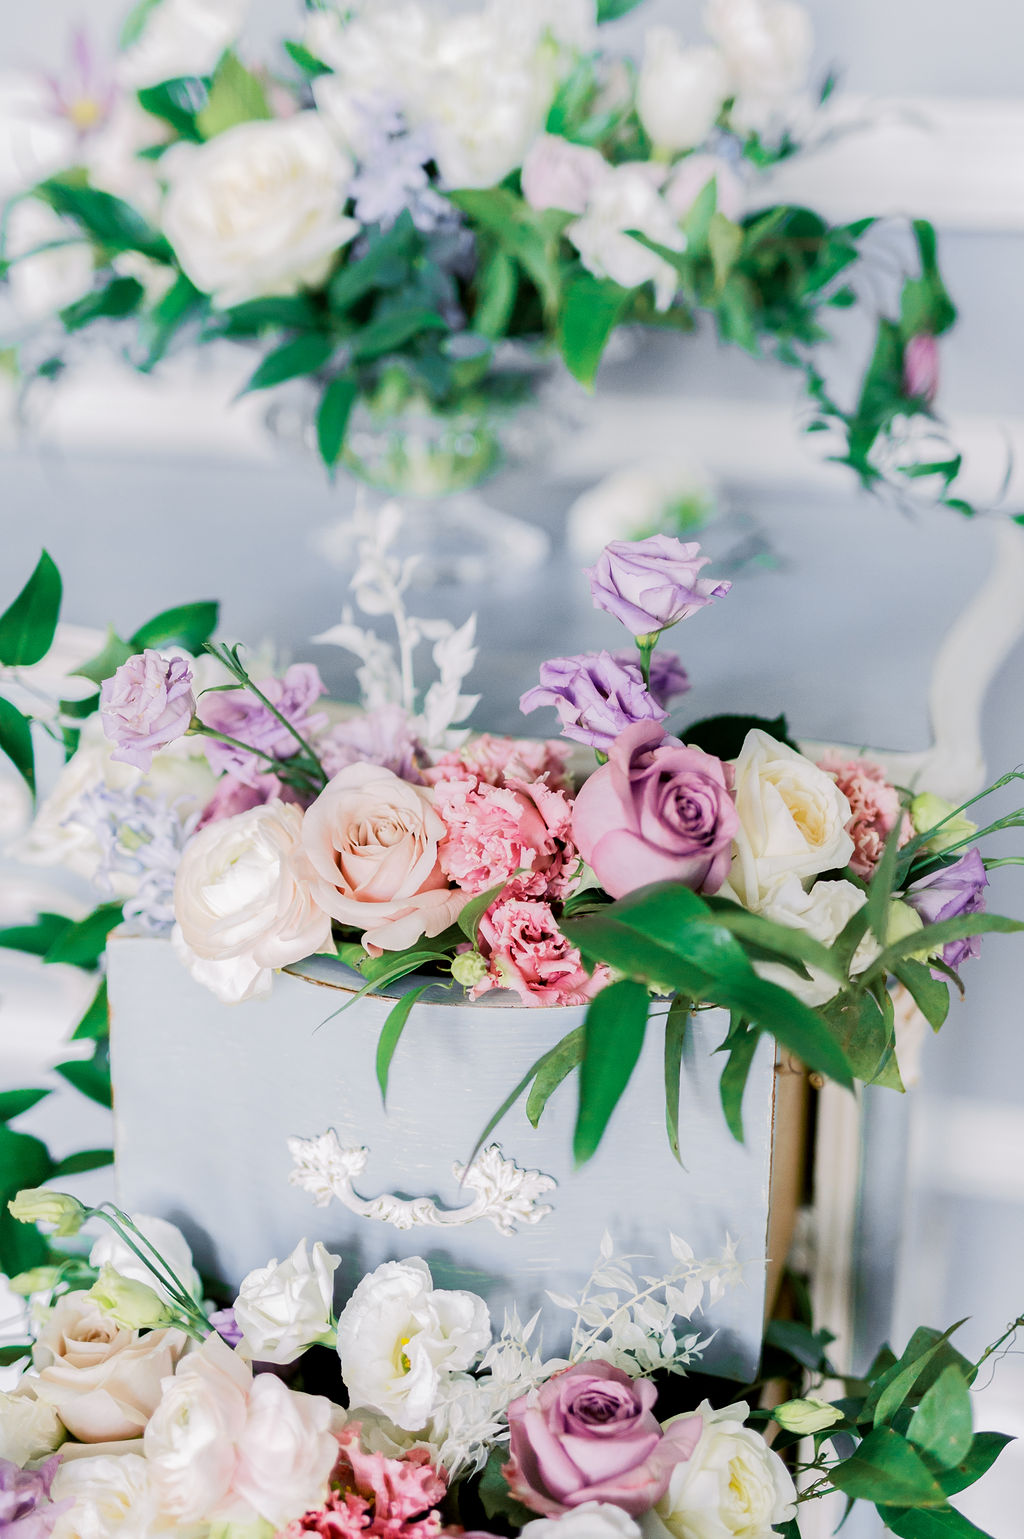 Romantic-French-Garden-WhitneyHeardPhotography-DSC_8507